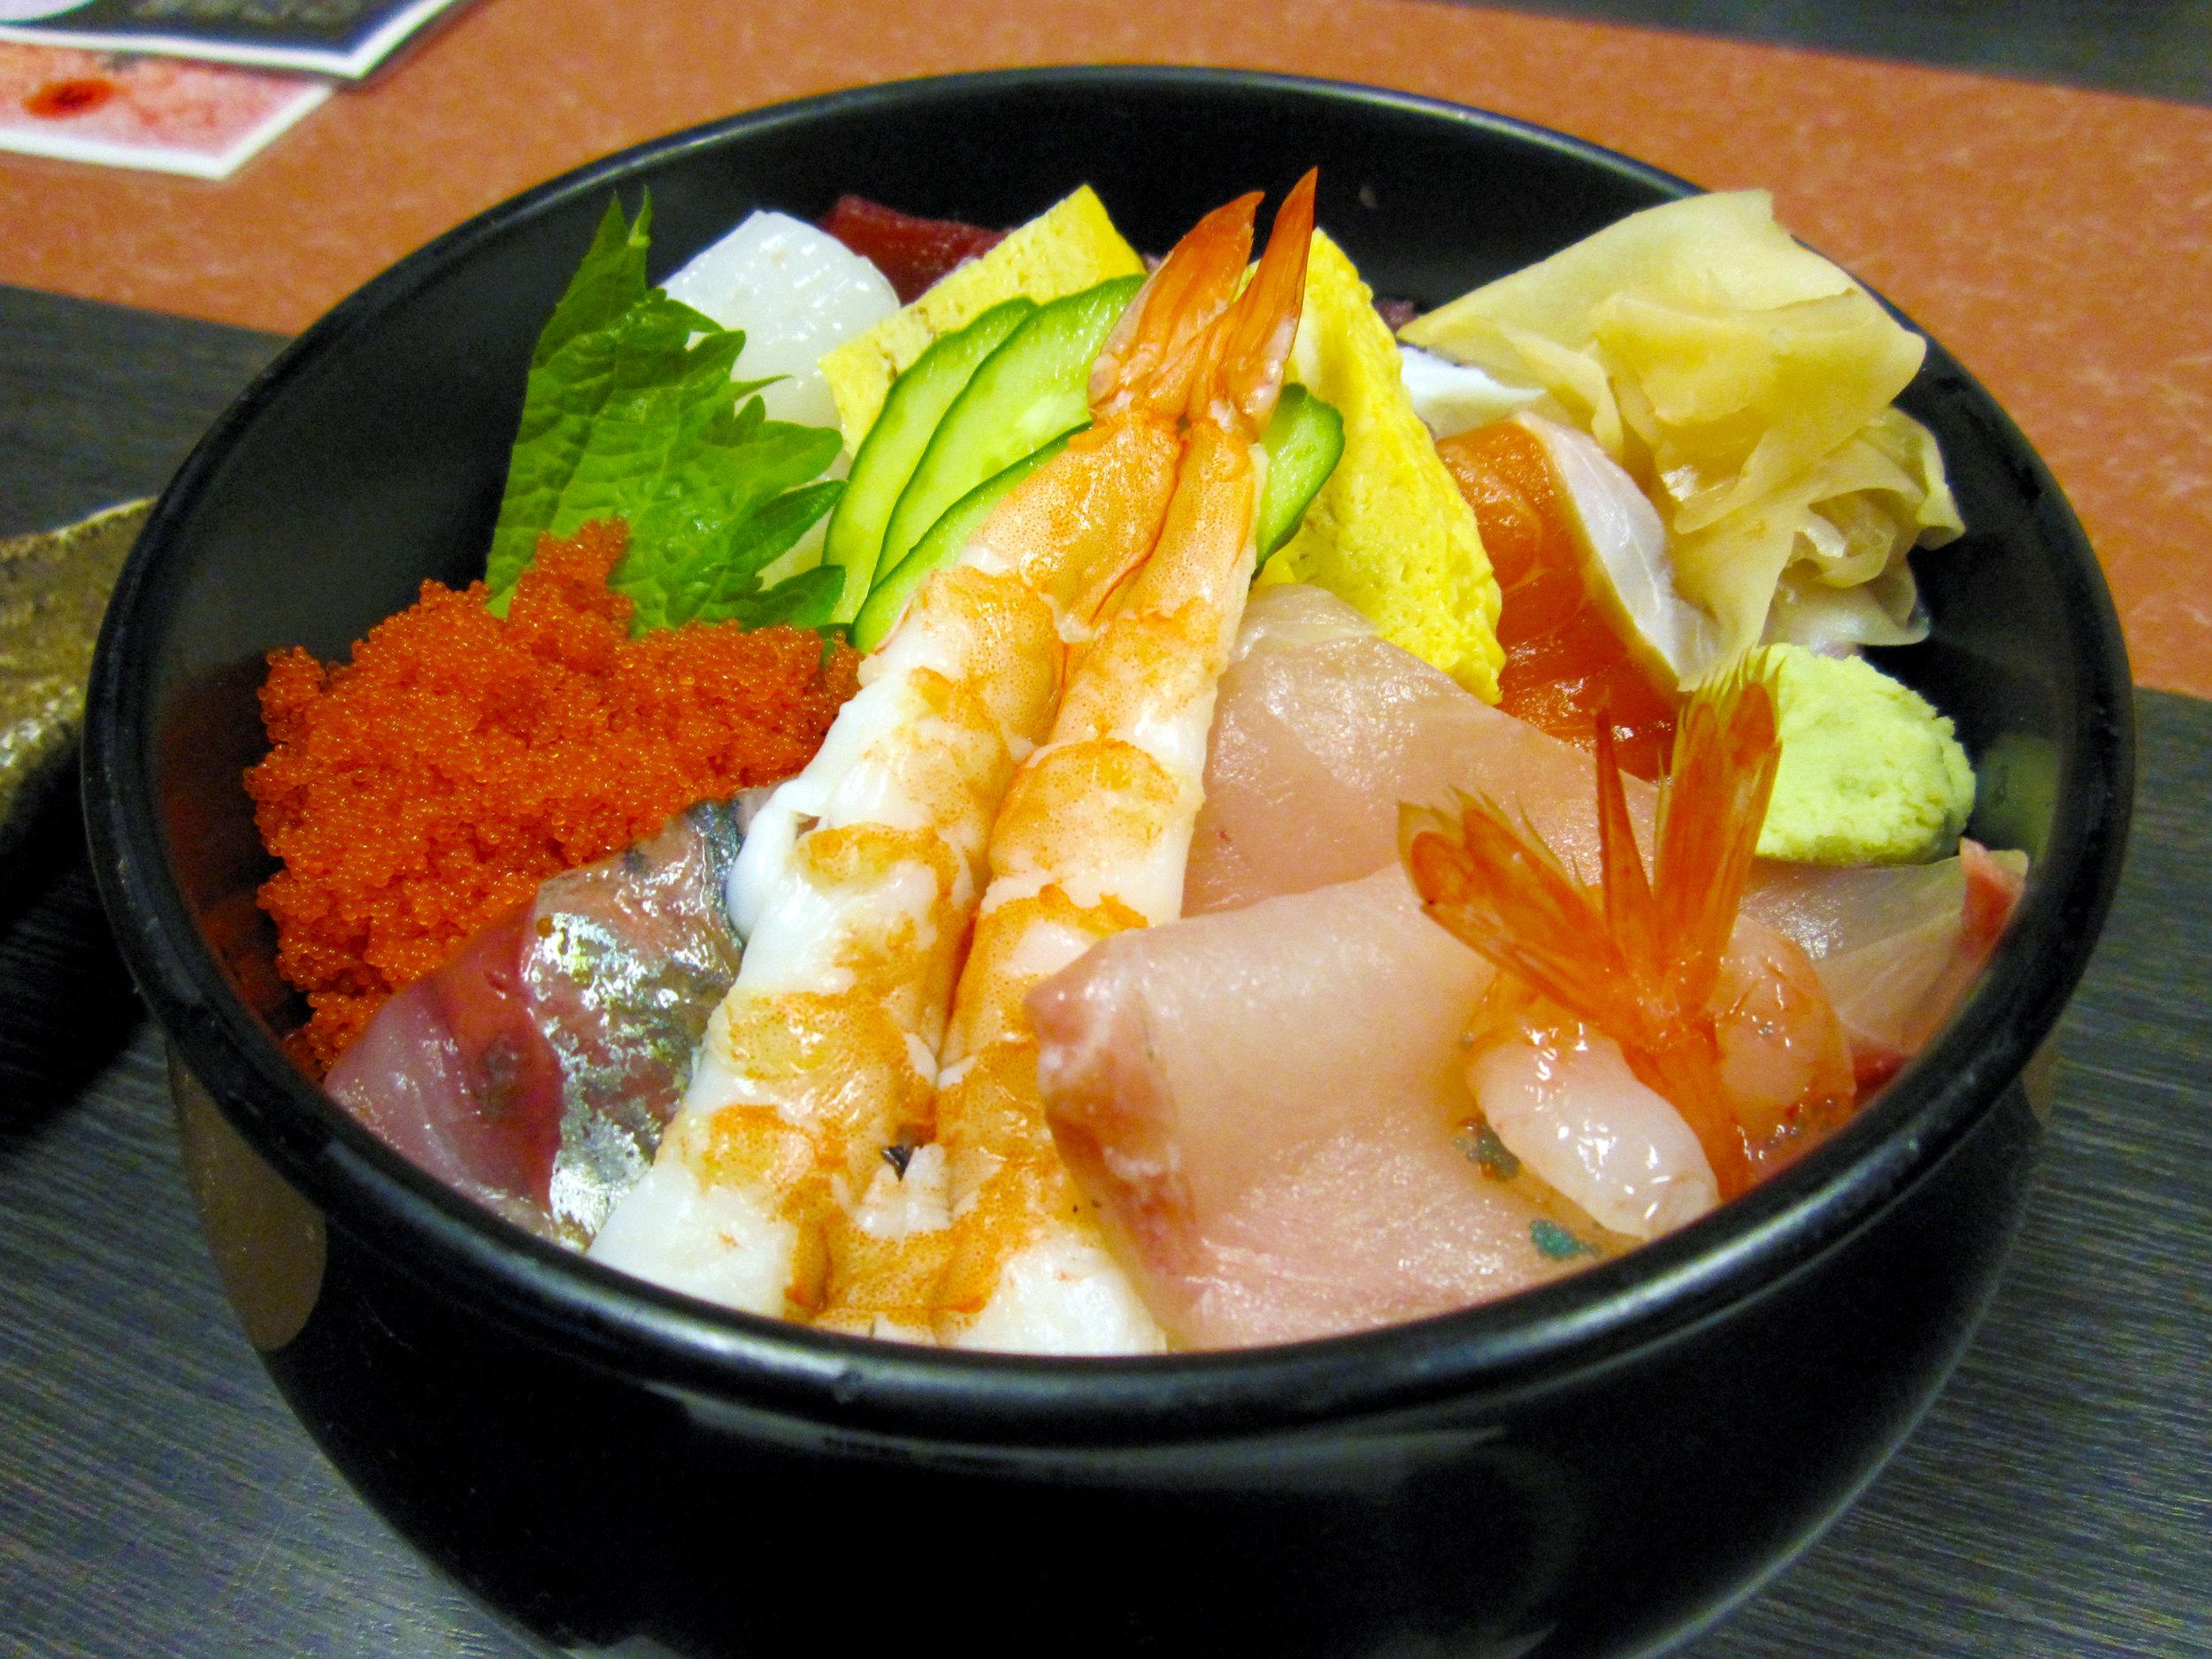 Chirashi_Zushi_Special_Bowl_San_Francisco_Japanese_Restaurant_Kui_Shin_Bo.jpg